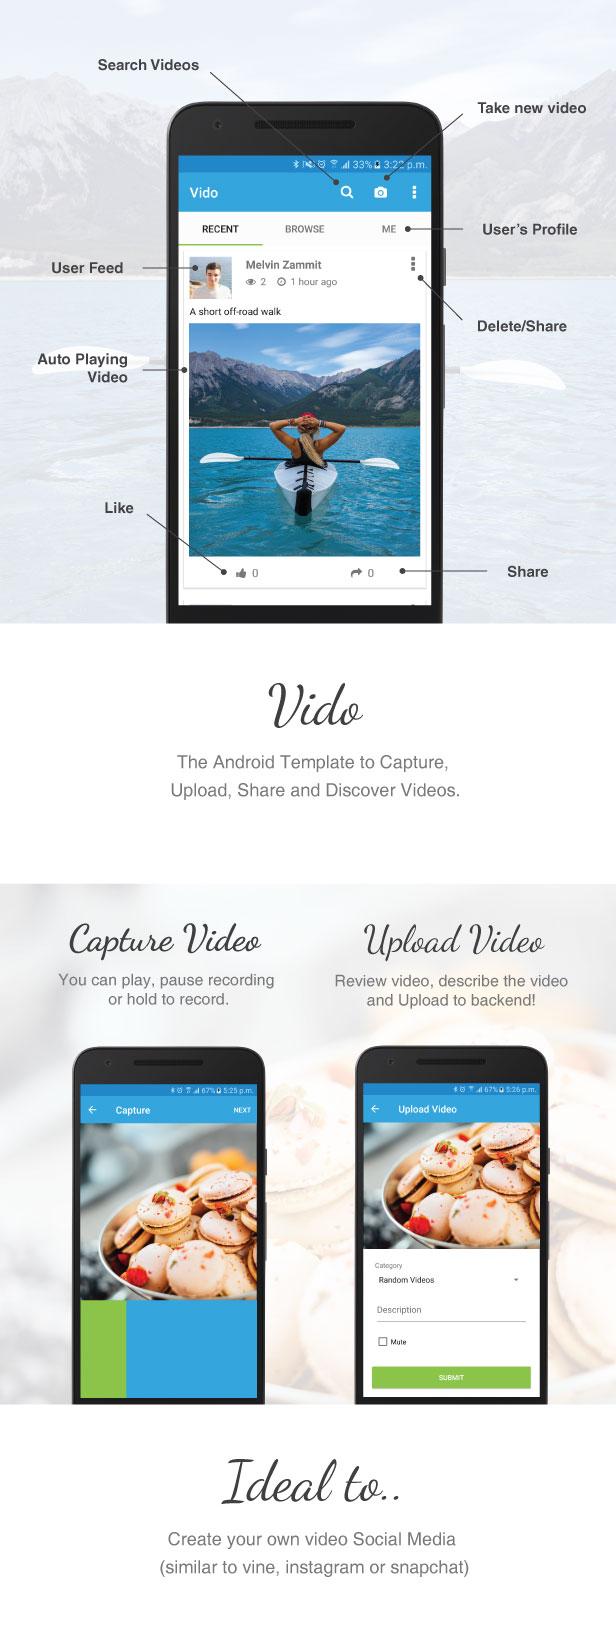 NeuronDigital We Build Android App Templates - Video ad templates